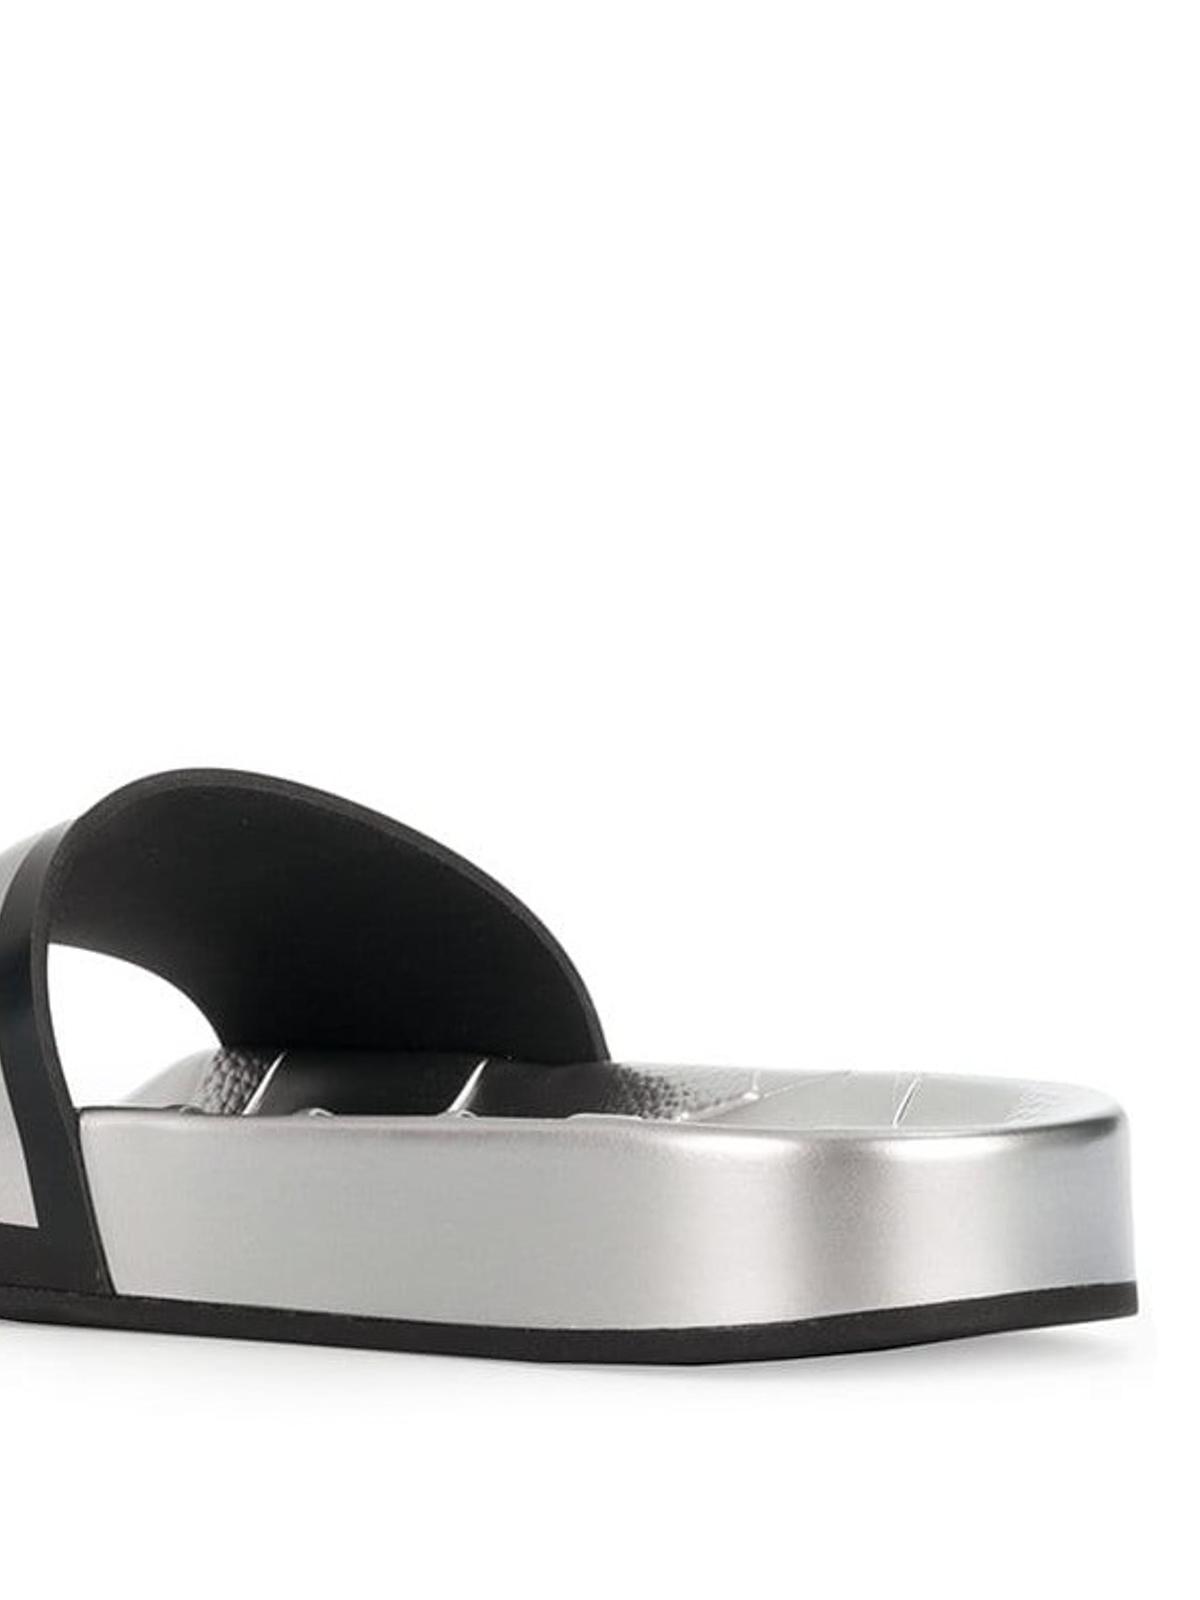 1a67eae60a4 Jimmy Choo - Rey/F logo metallic silver rubber slides - sandals ...